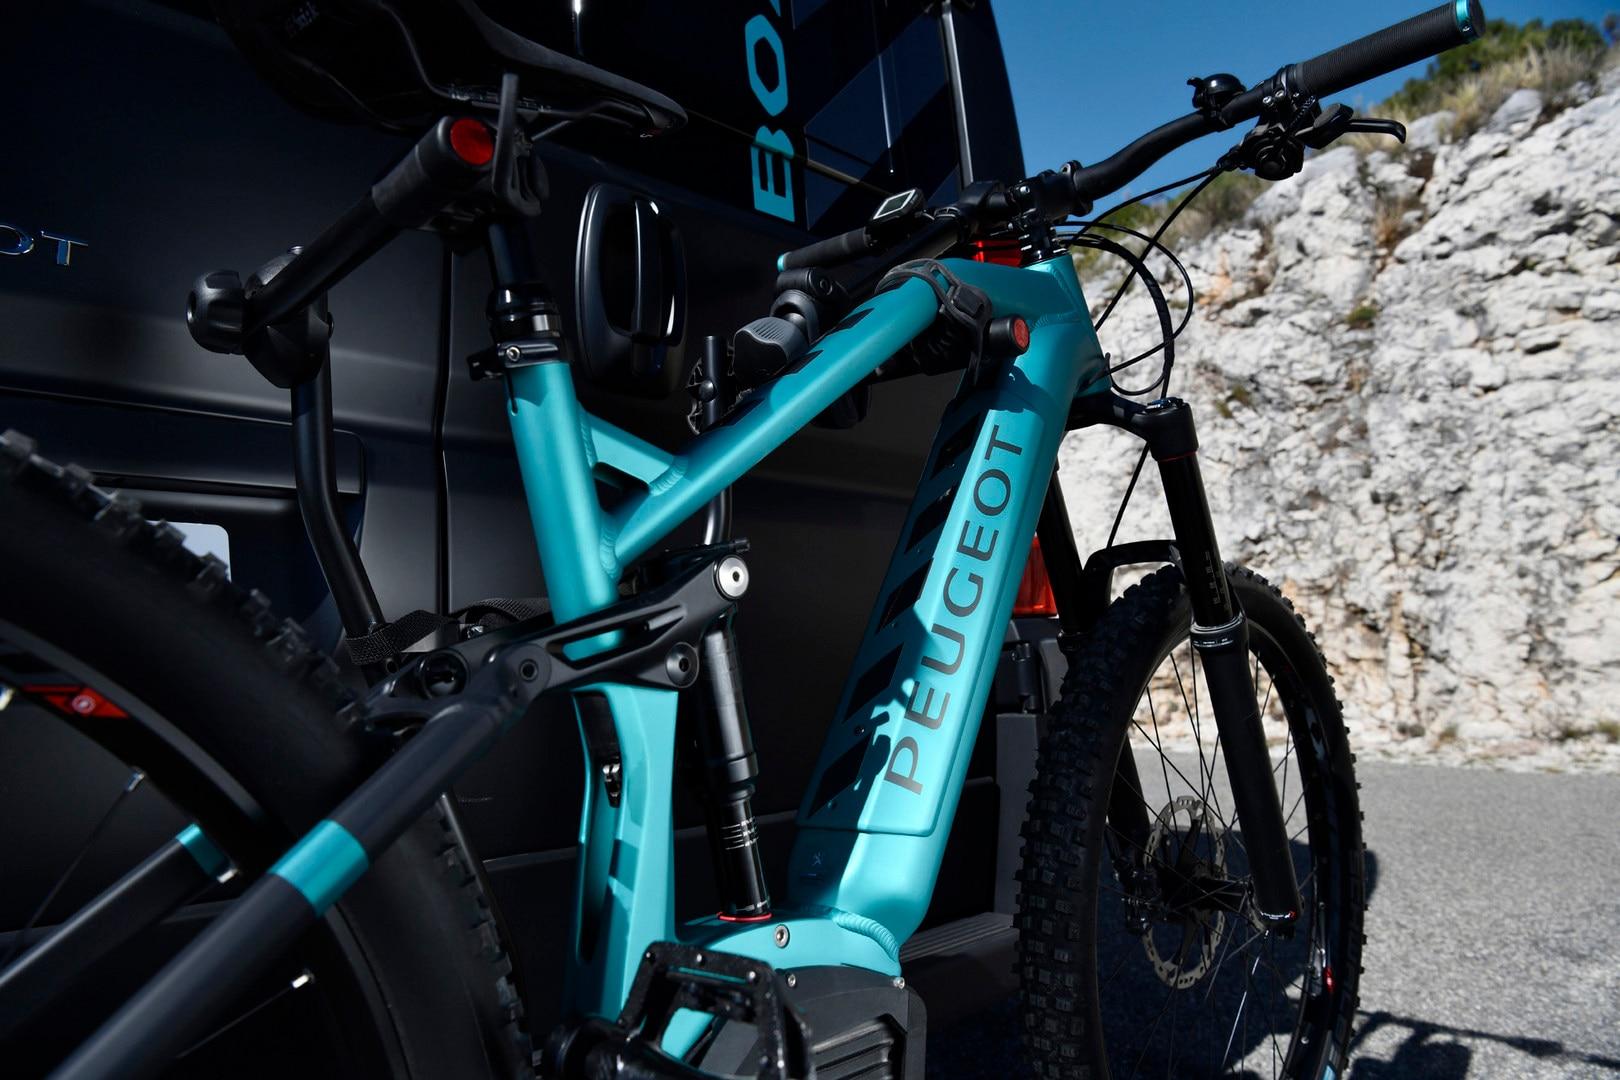 PEUGEOT BOXER 4x4 CONCEPT: PEUGEOT eM02 FS Powertube MTB, electrically assisted mountain bike, the latest generation of PEUGEOT eBikes.